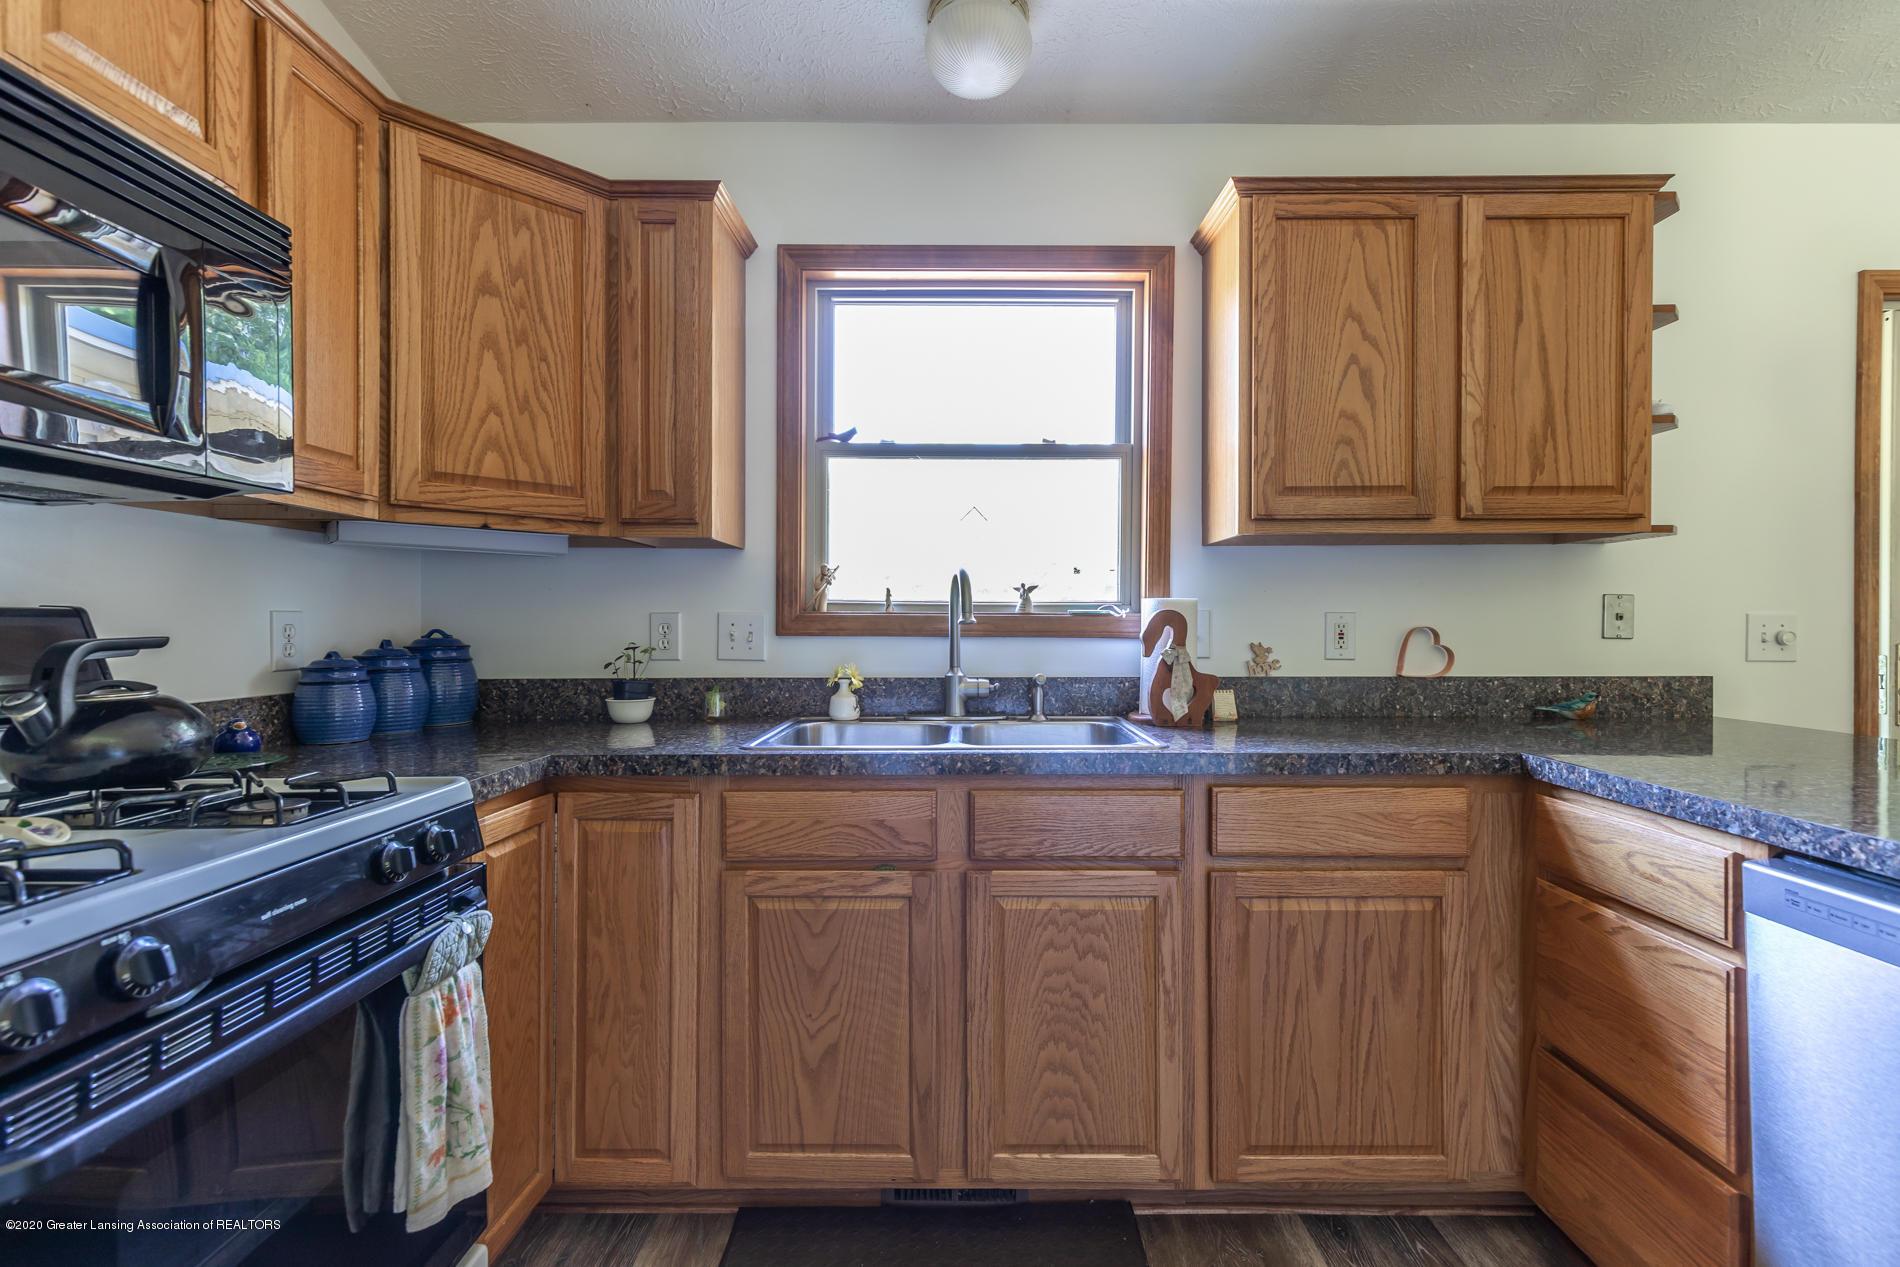 2229 S Chester Rd - Kitchen 1 - 5